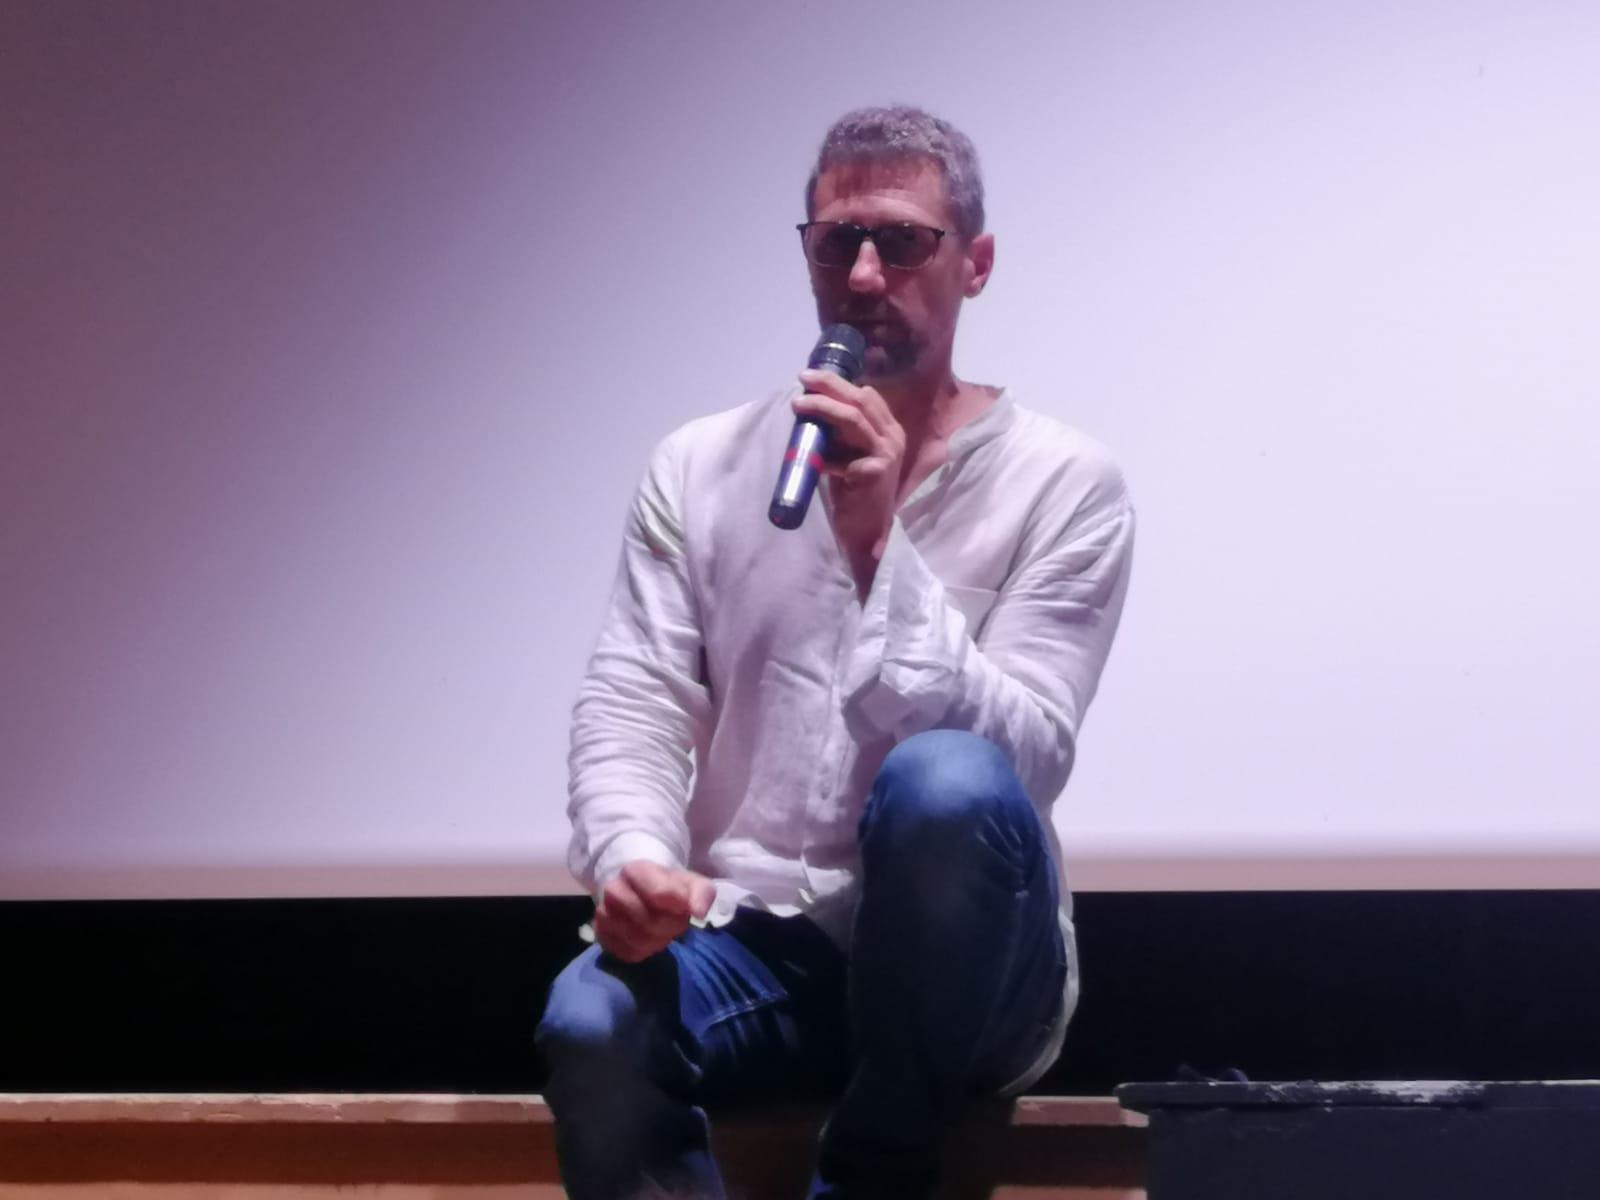 Enrico Montrosset